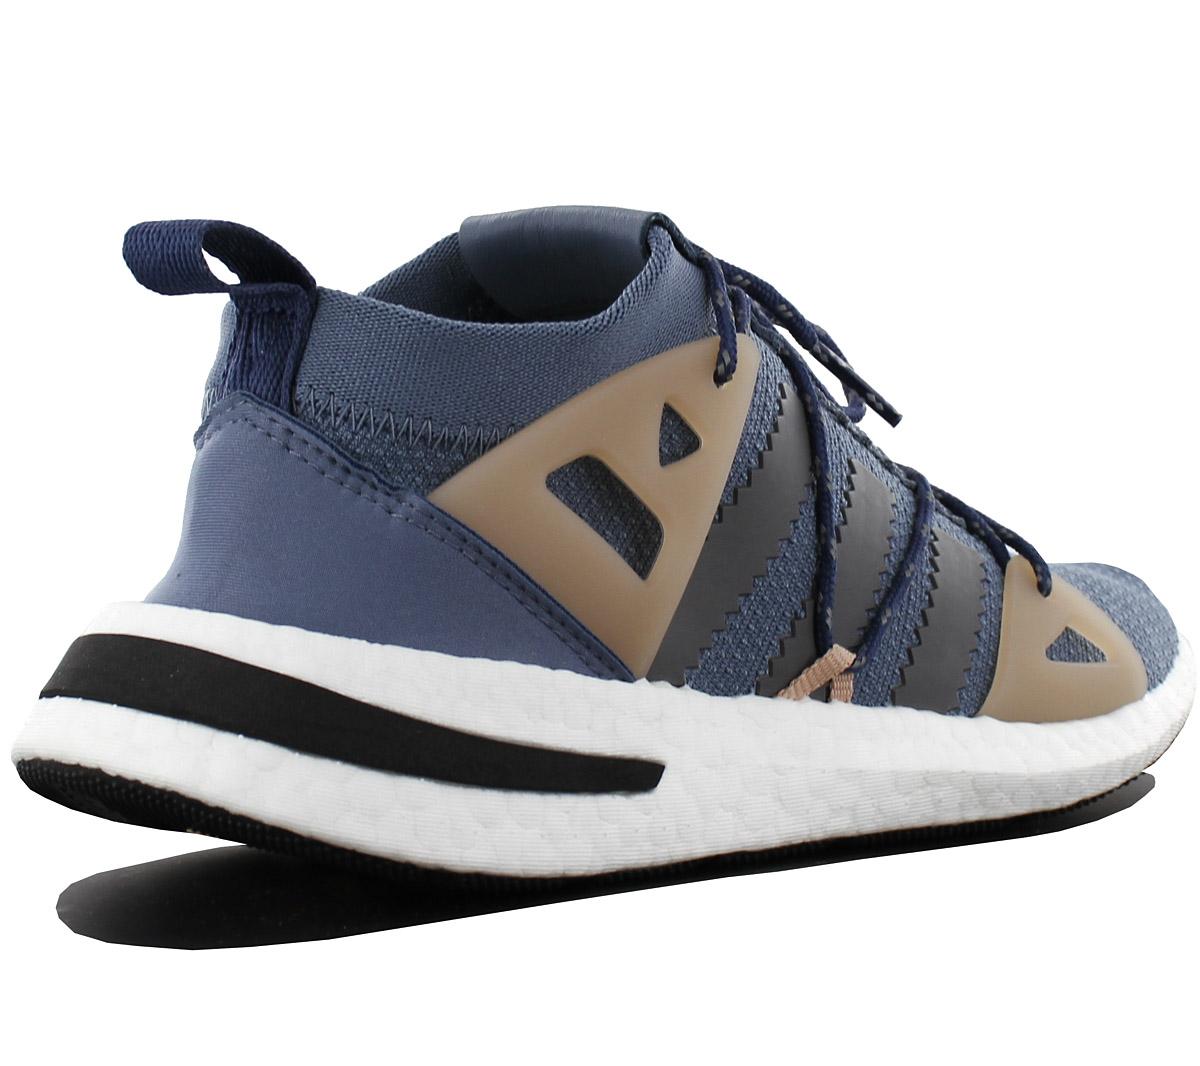 timeless design 4a315 b2635 Adidas Originals Arkyn W Boost Ladies Sneaker Shoes Blue Da9